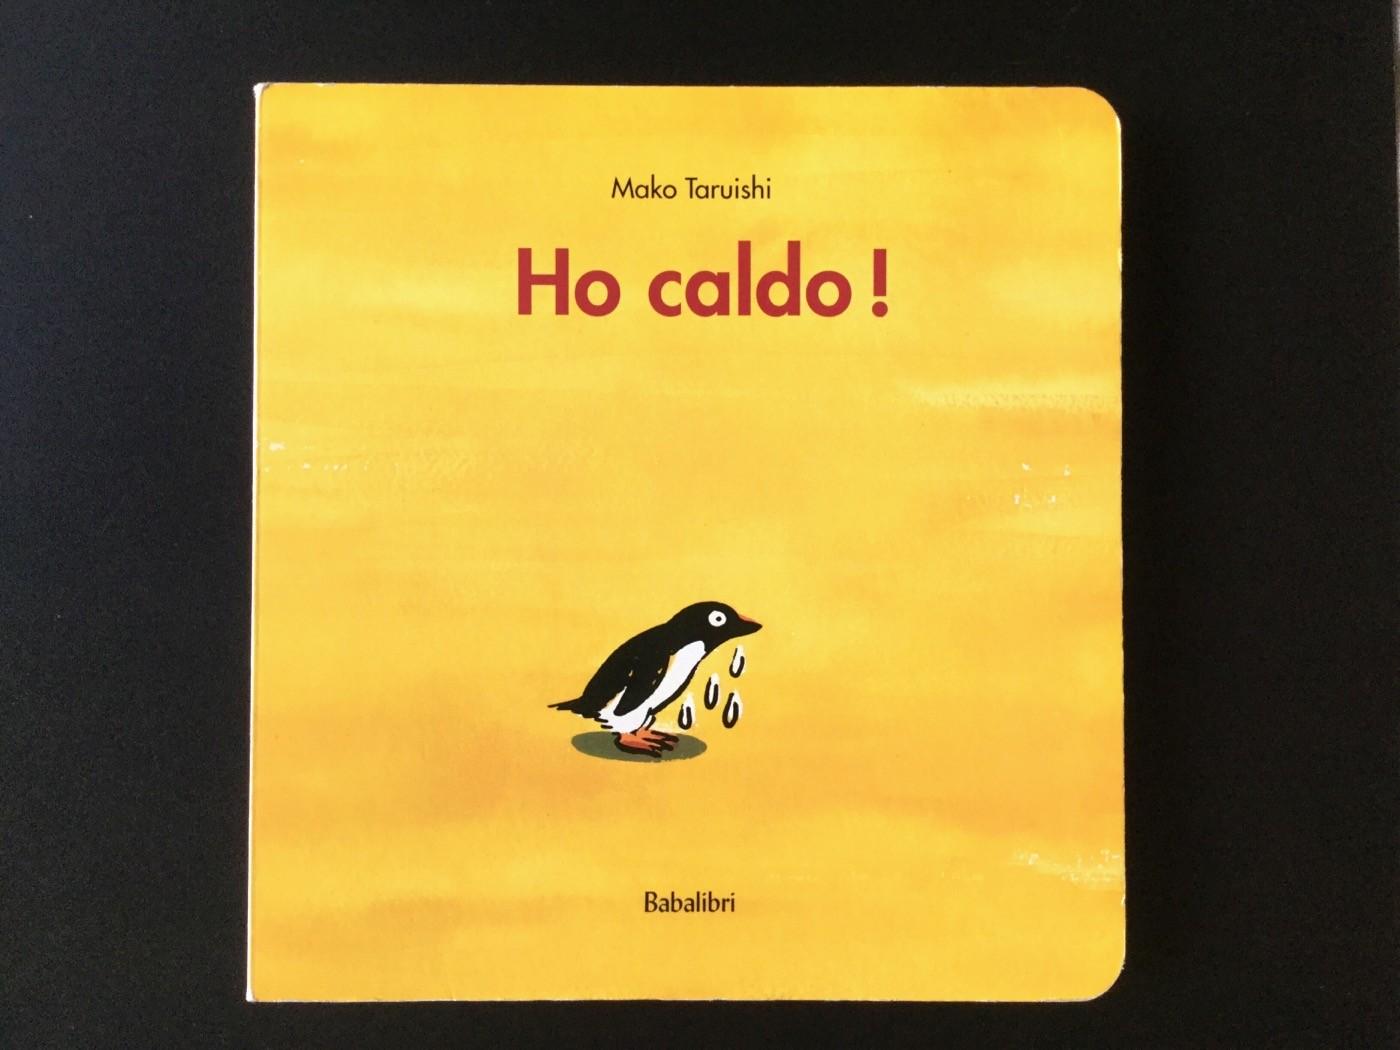 Ho_caldo_Mako_Taruishi_Babalibri_Galline_Volanti